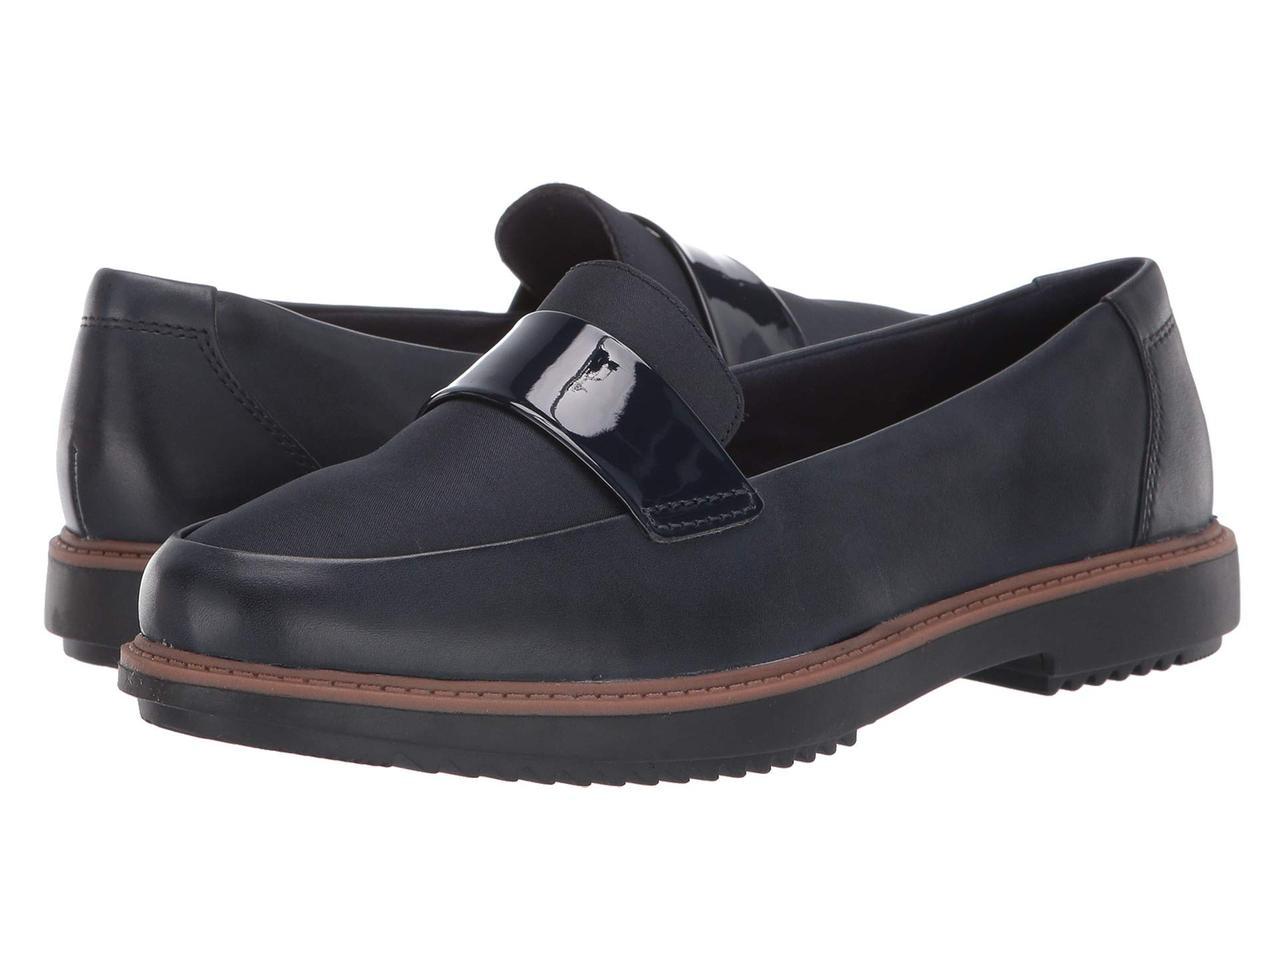 Мокасины (Оригинал) Clarks Raisie Arlie Navy Leather/Textile Combi